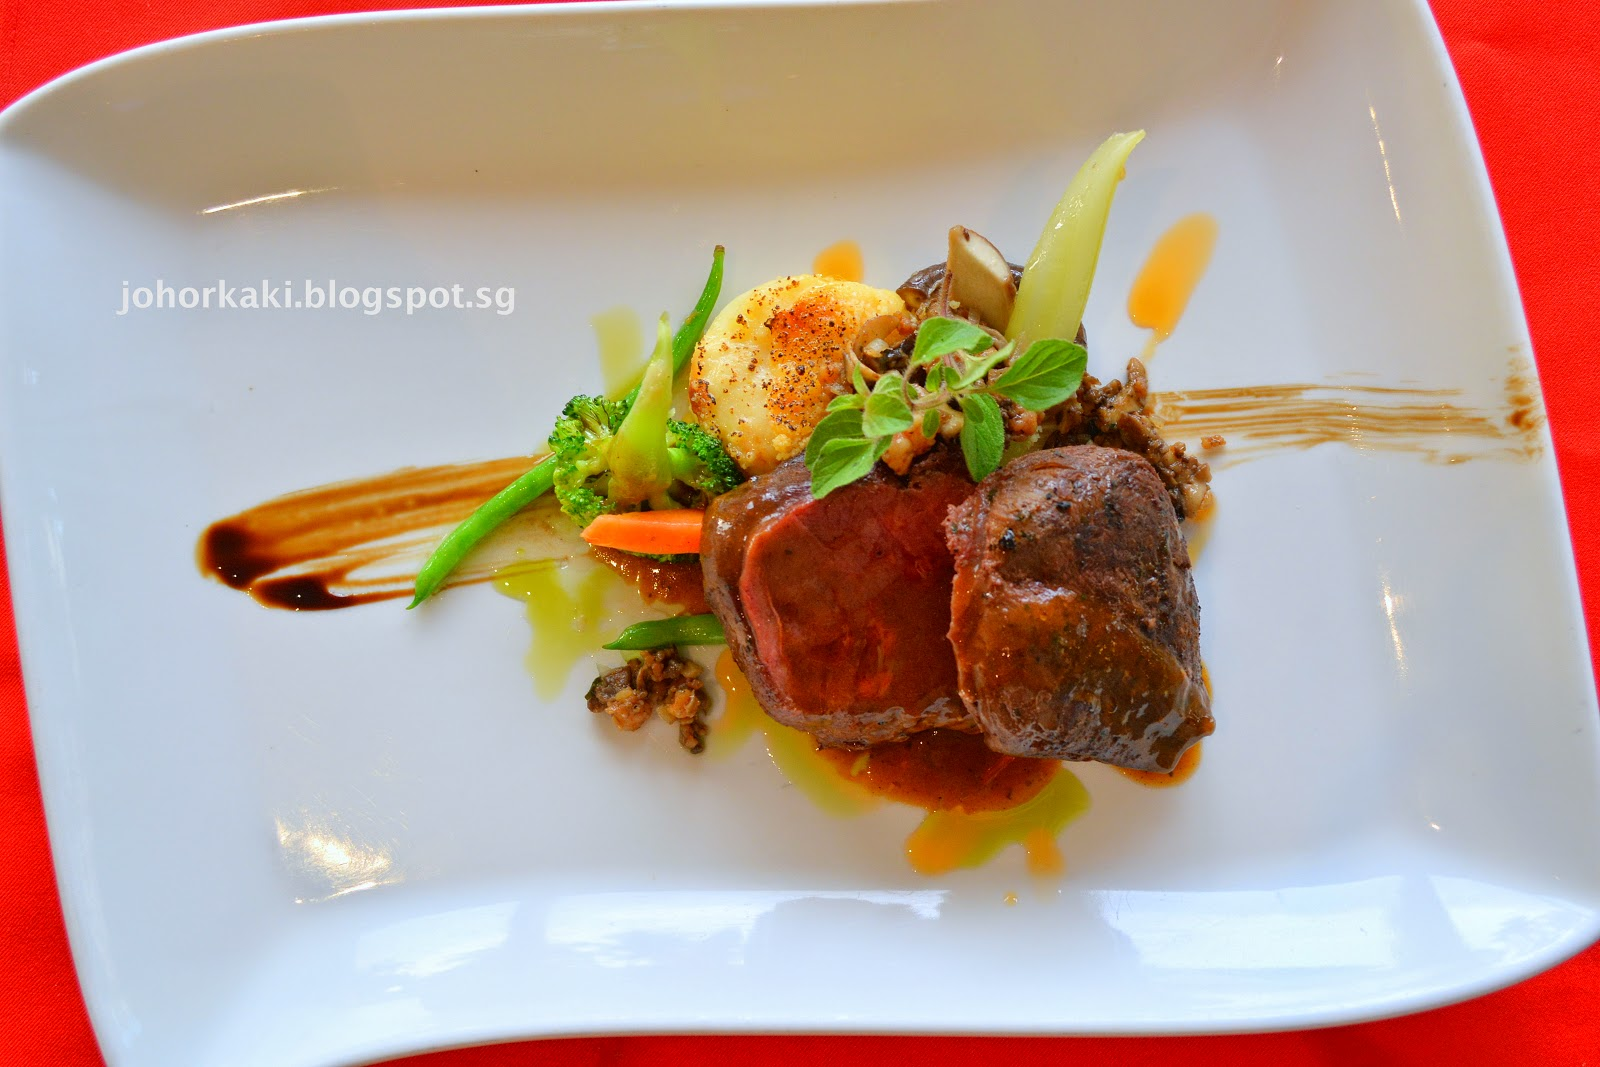 Thistle Port Dickson Valentine Dinner - A True Night of Romance at ...